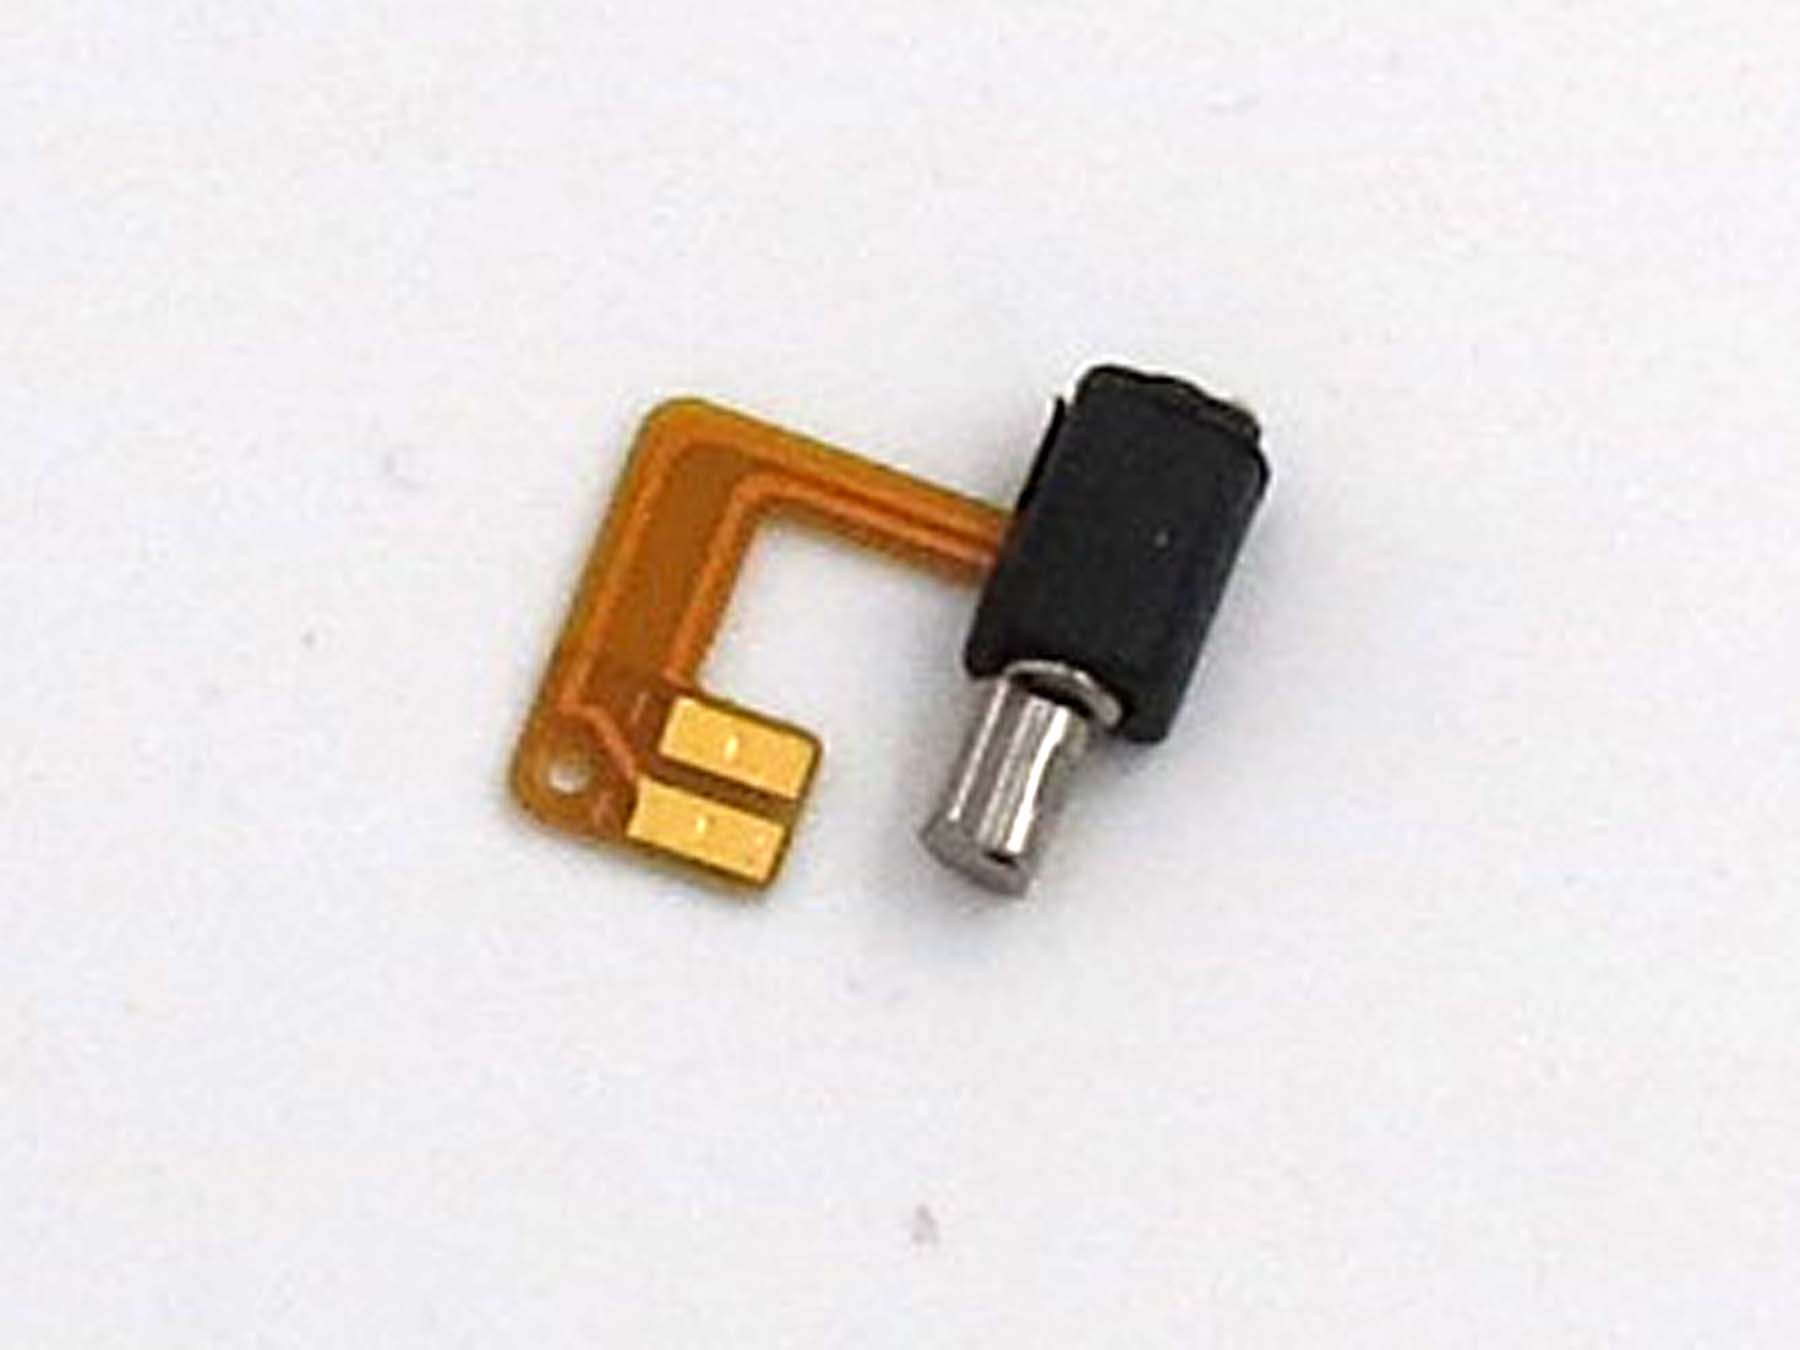 New Light Led Fpc Button Flex Cable Repair Parts For Xiaomi Mi F1 5 Redmi Note 3 Note 4 Mobile Phone Flex Cables Mobile Phone Parts